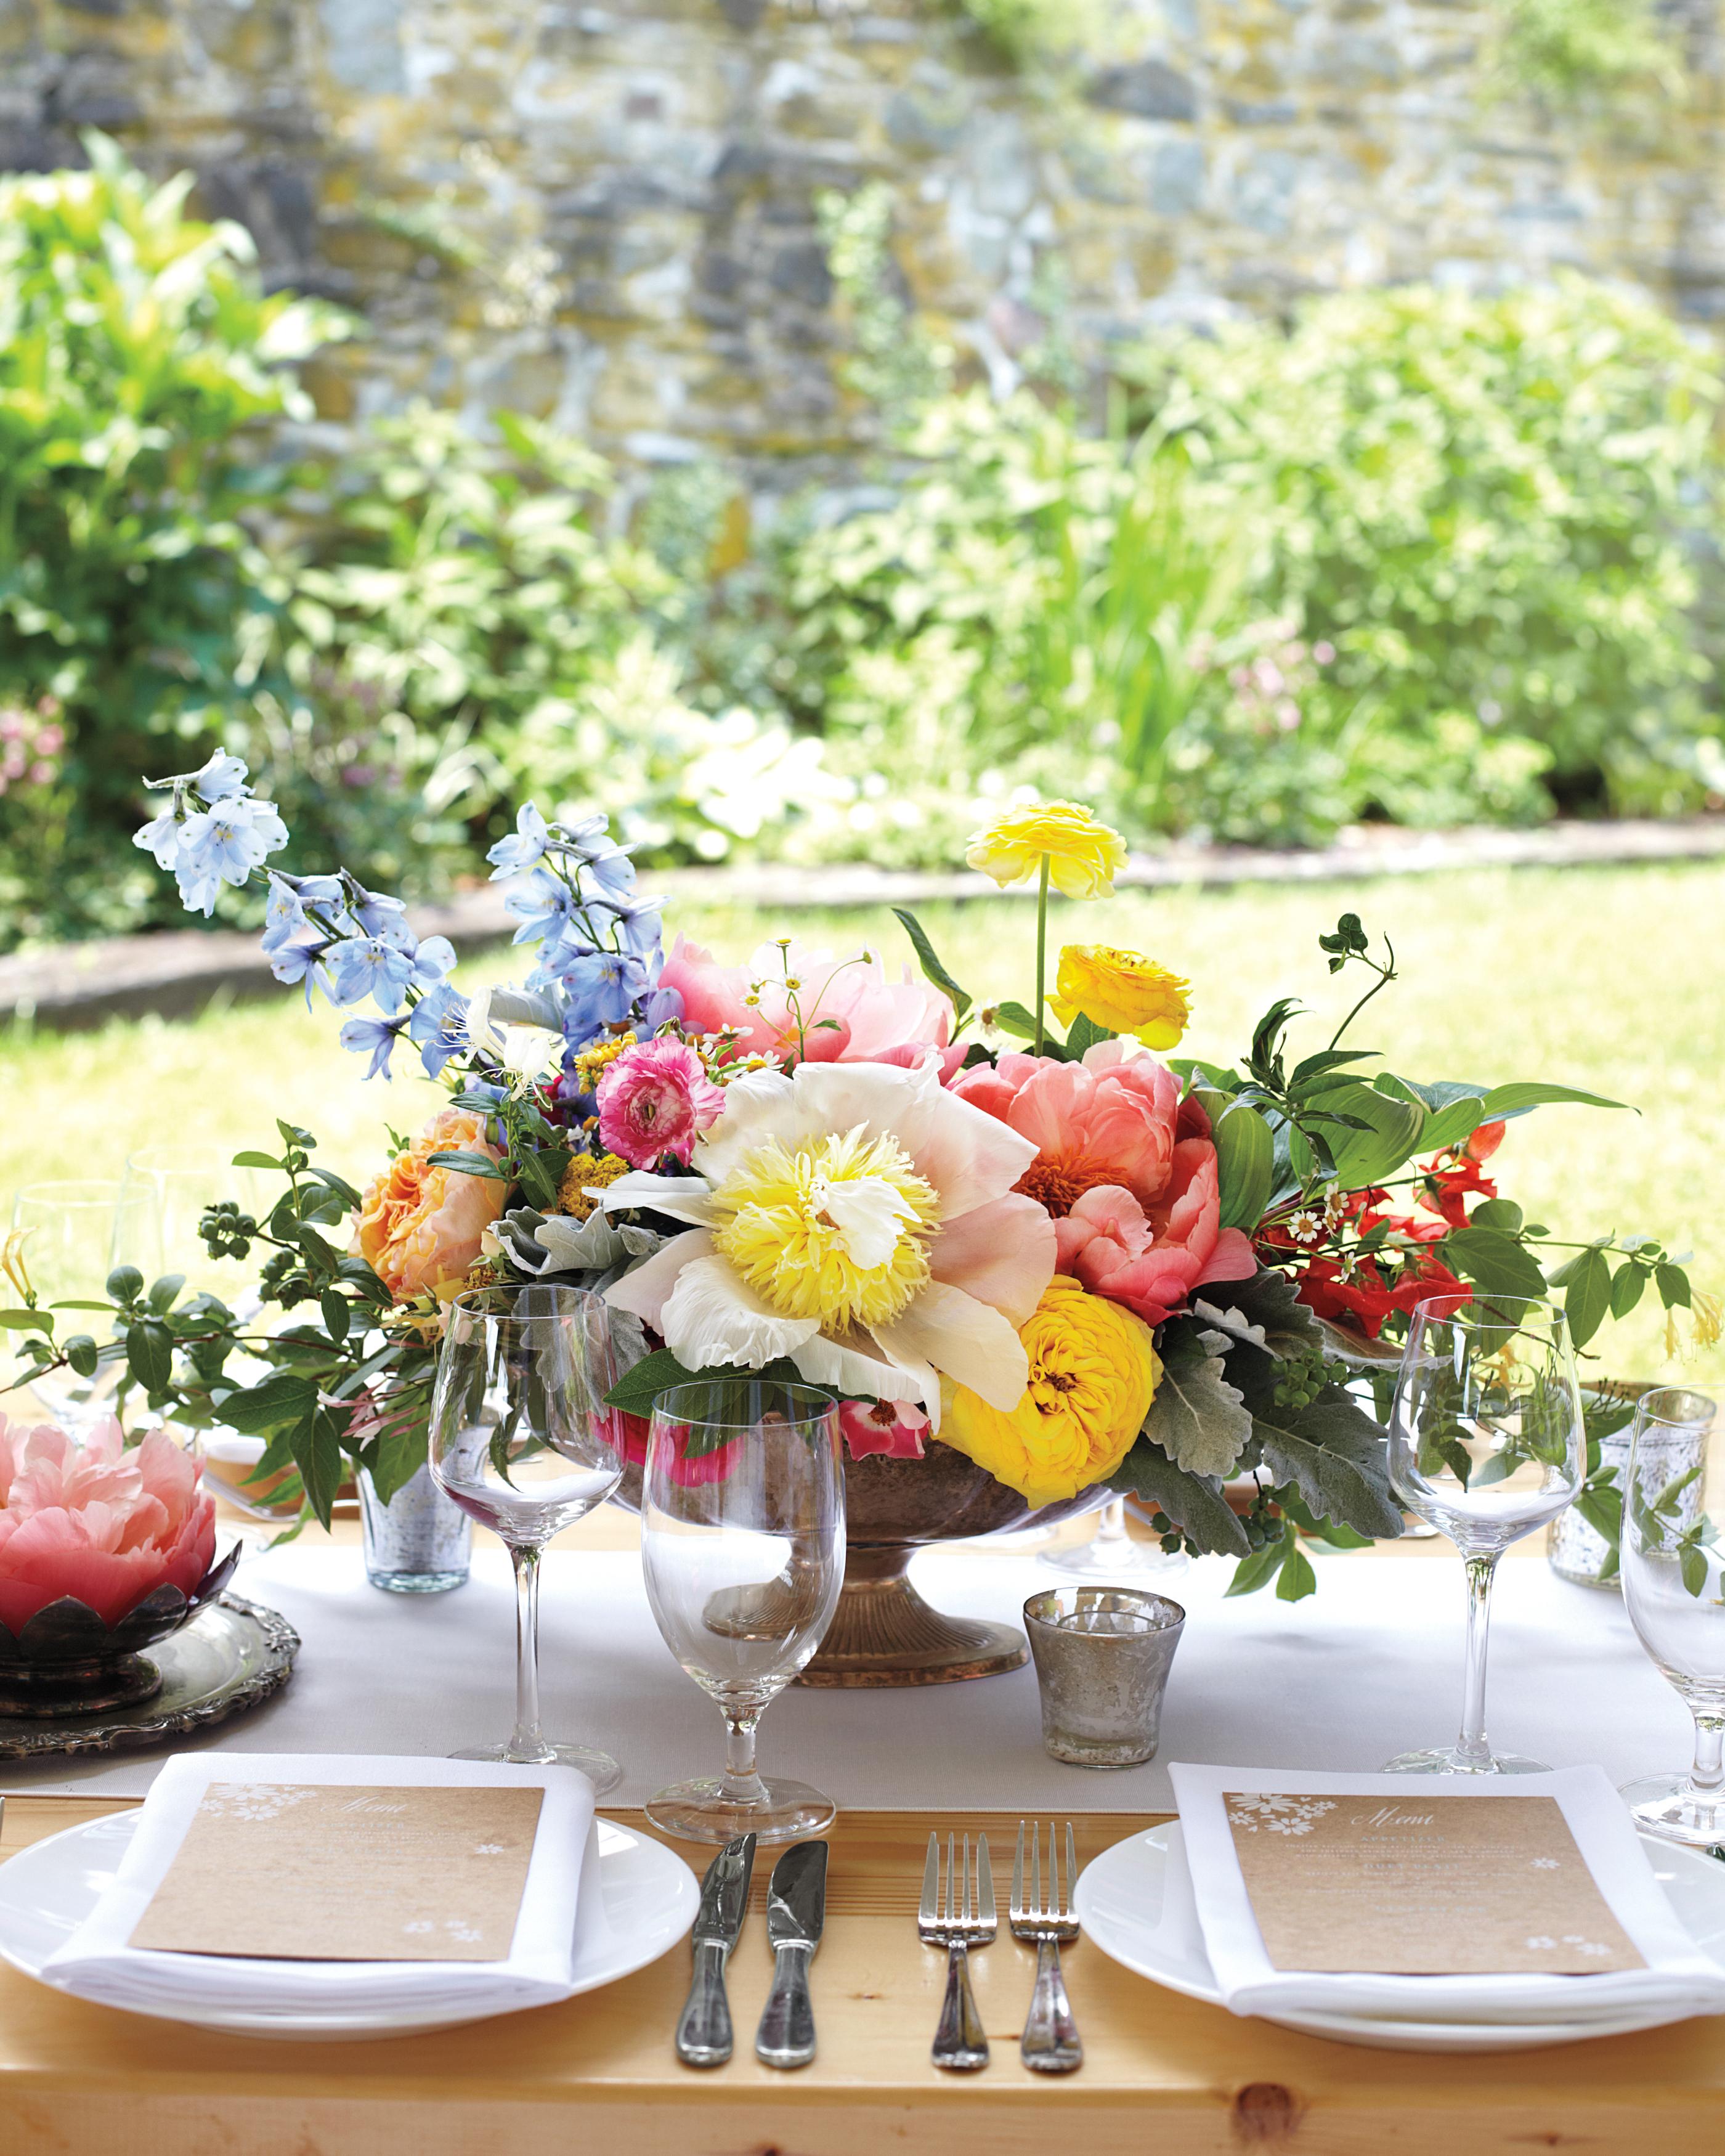 leanna-matt-wedding-reception-table-0013-s111371.jpg